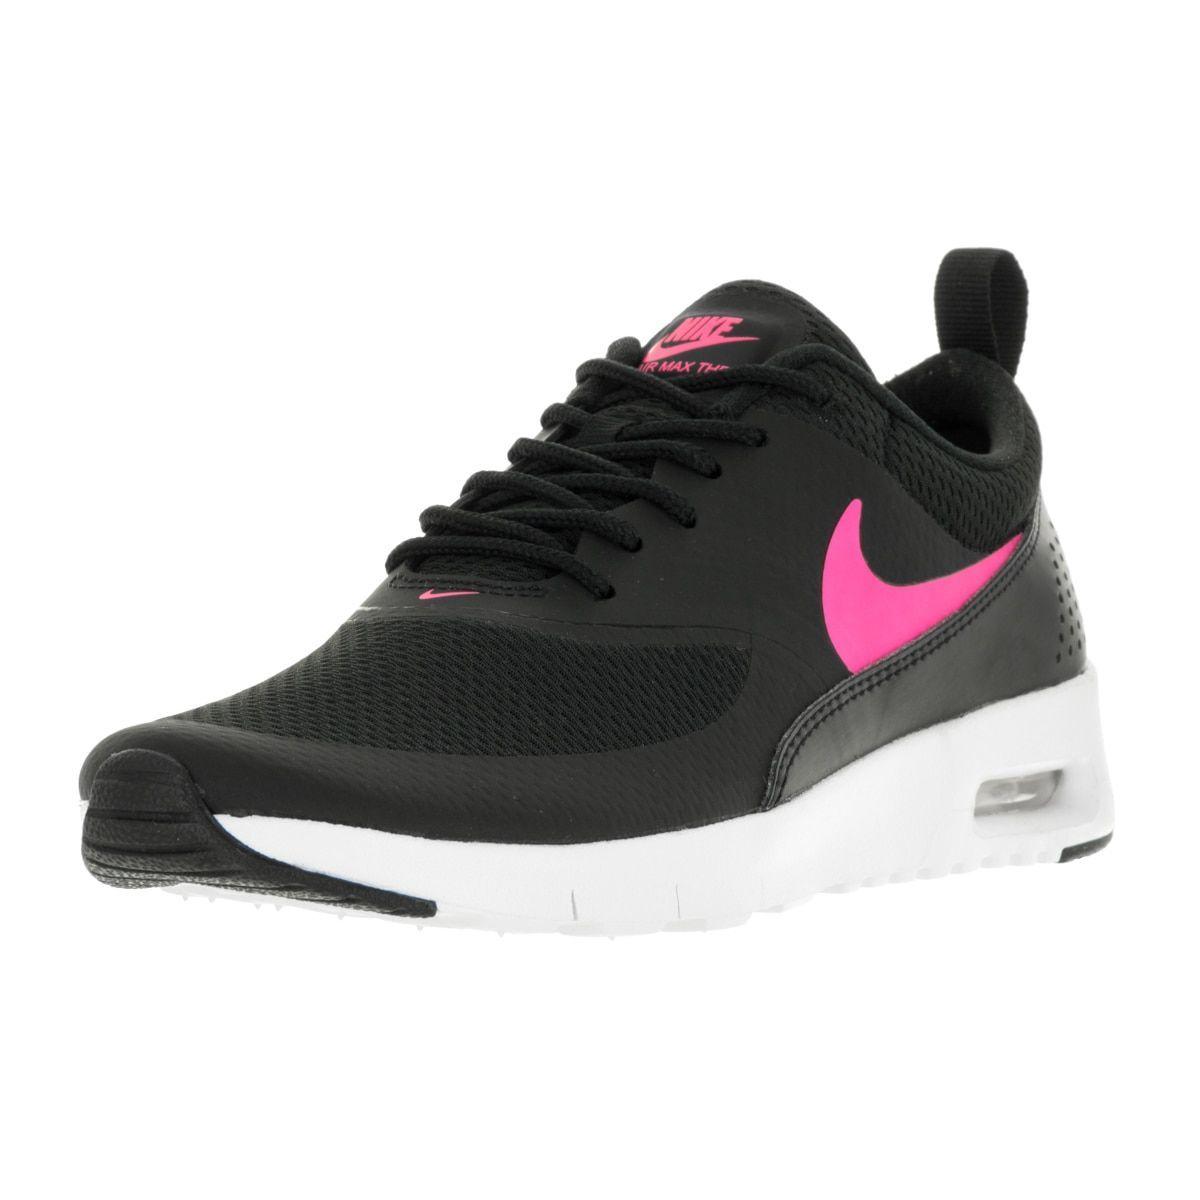 Femmes Tanjun Traillaufschuhe Nike VNK7x